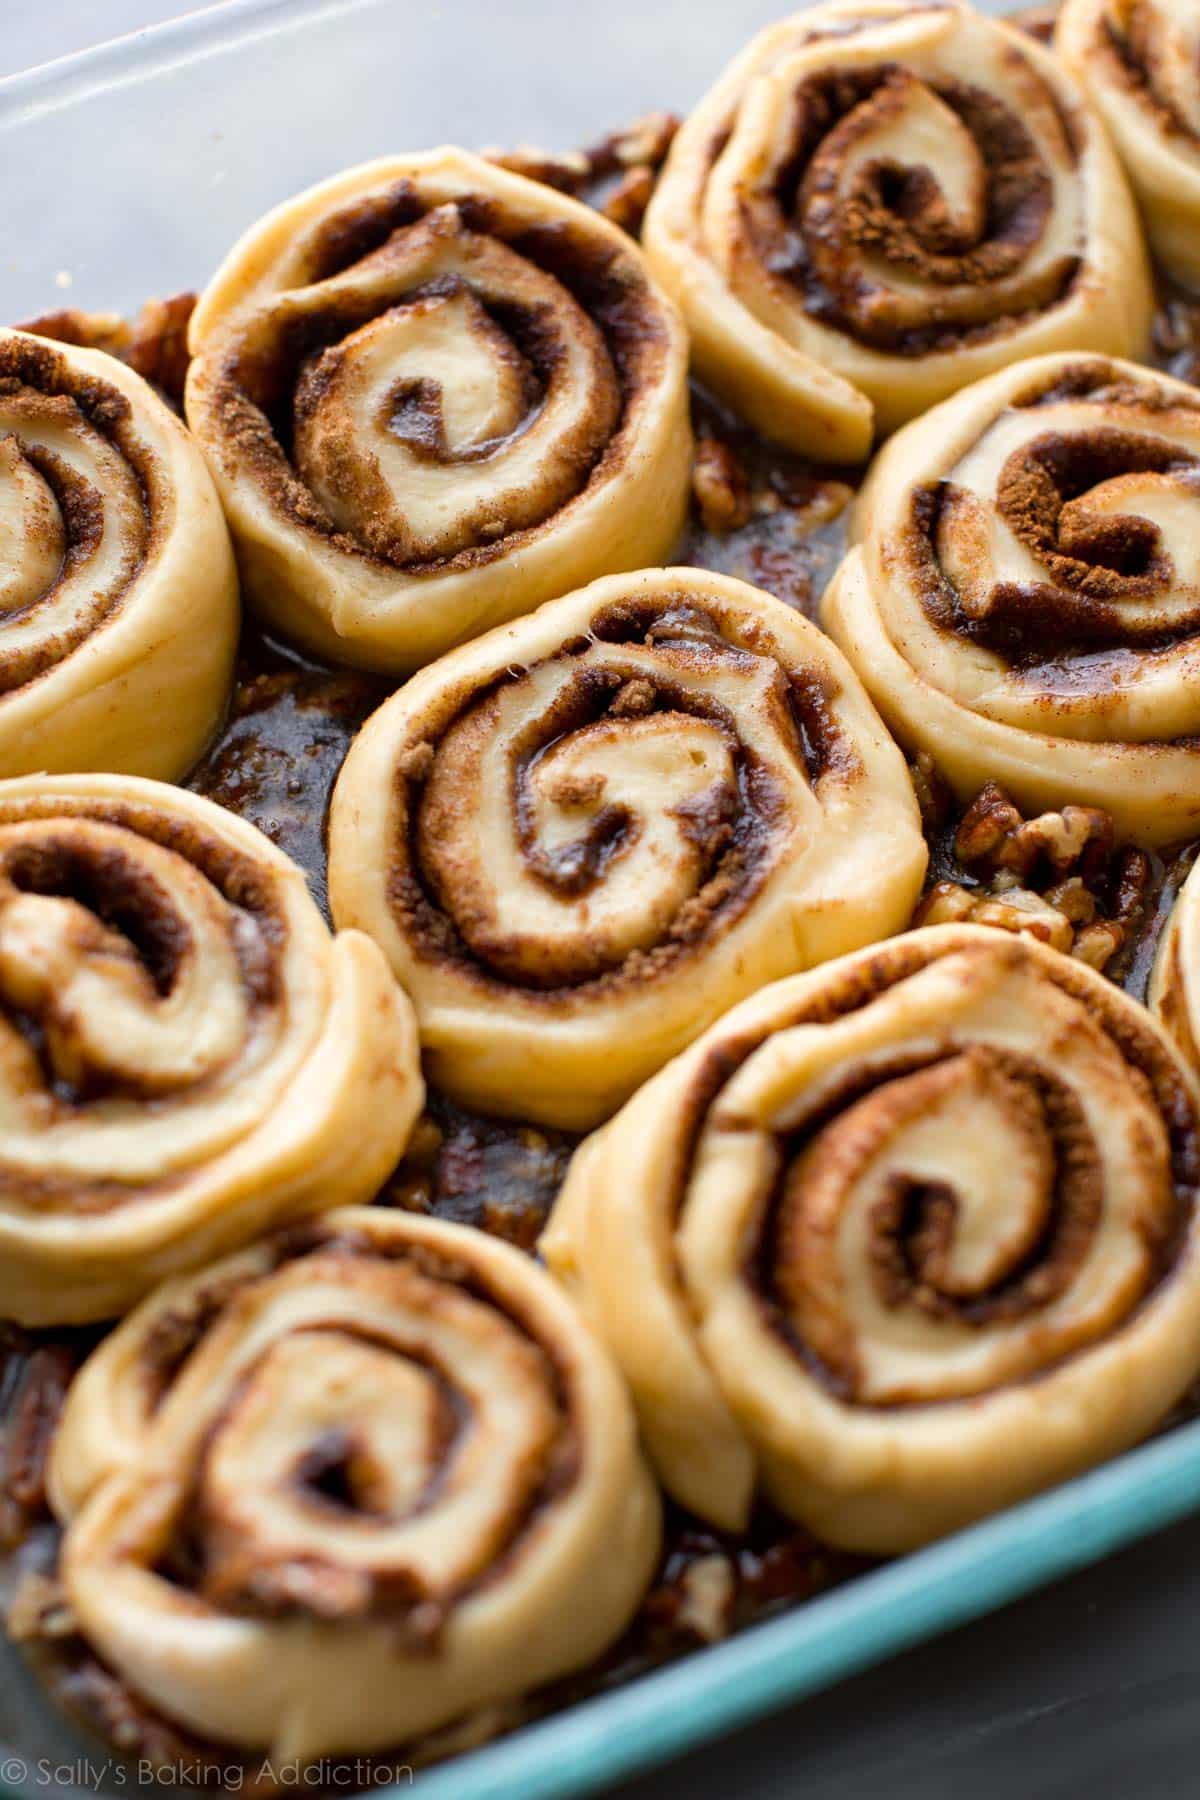 How to make maple pecan sticky buns on sallysbakingaddiction.com